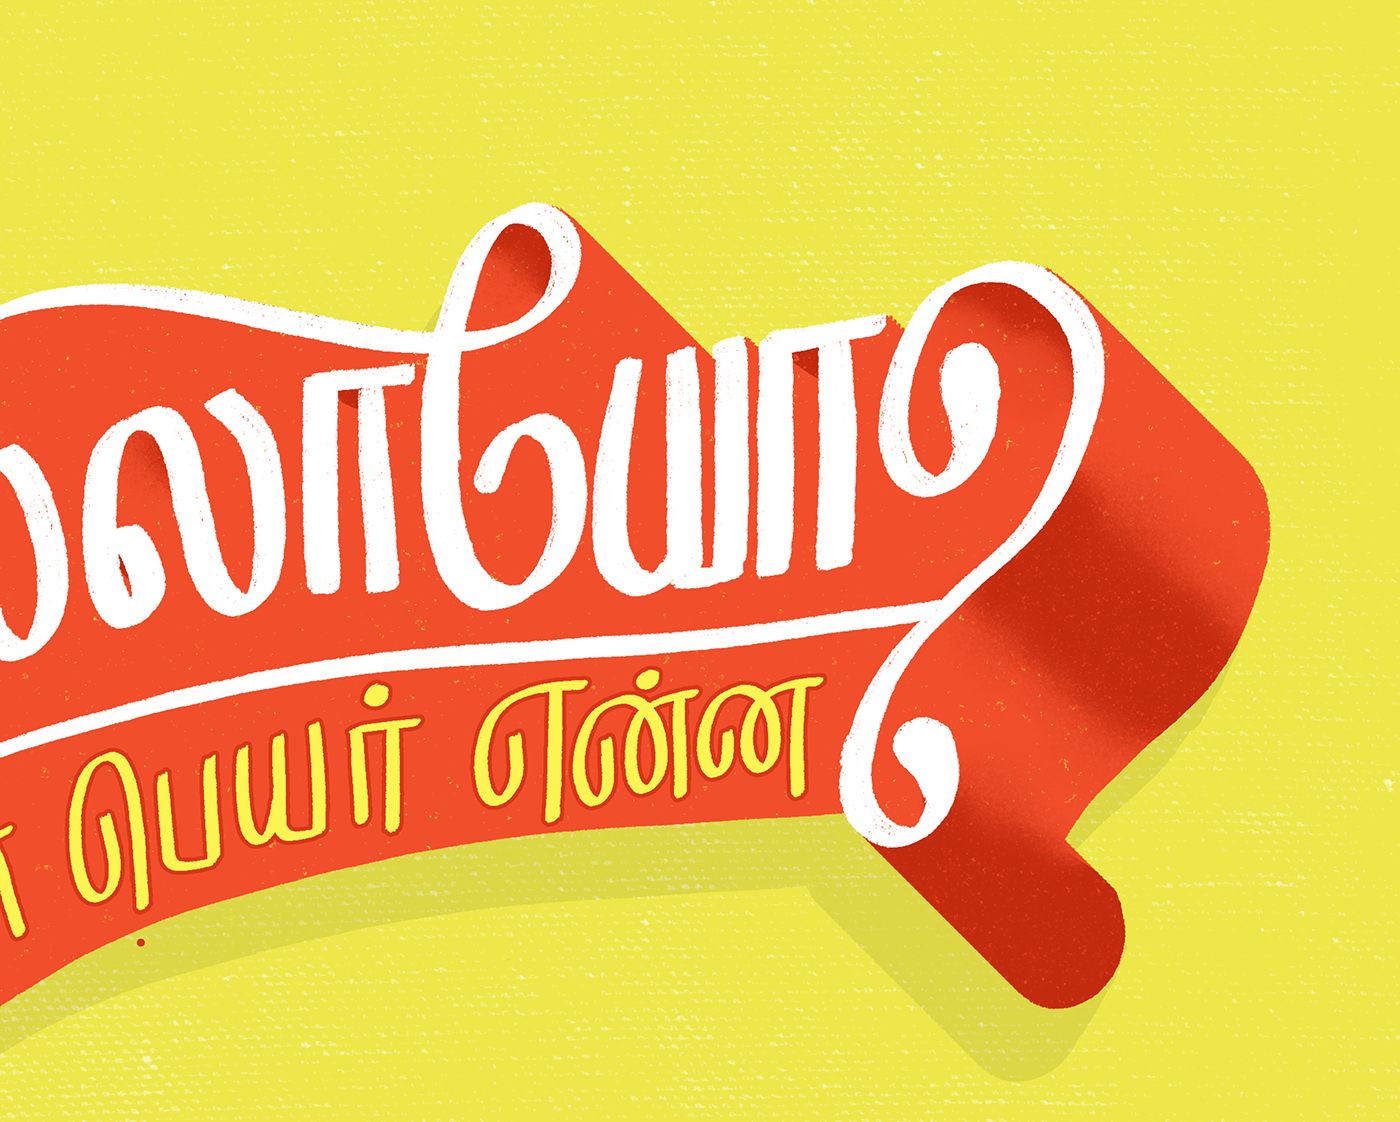 tamil,tamiltypography,Sri lanka,India,Tamilcinema,tamilfont,tamillettering,lettering